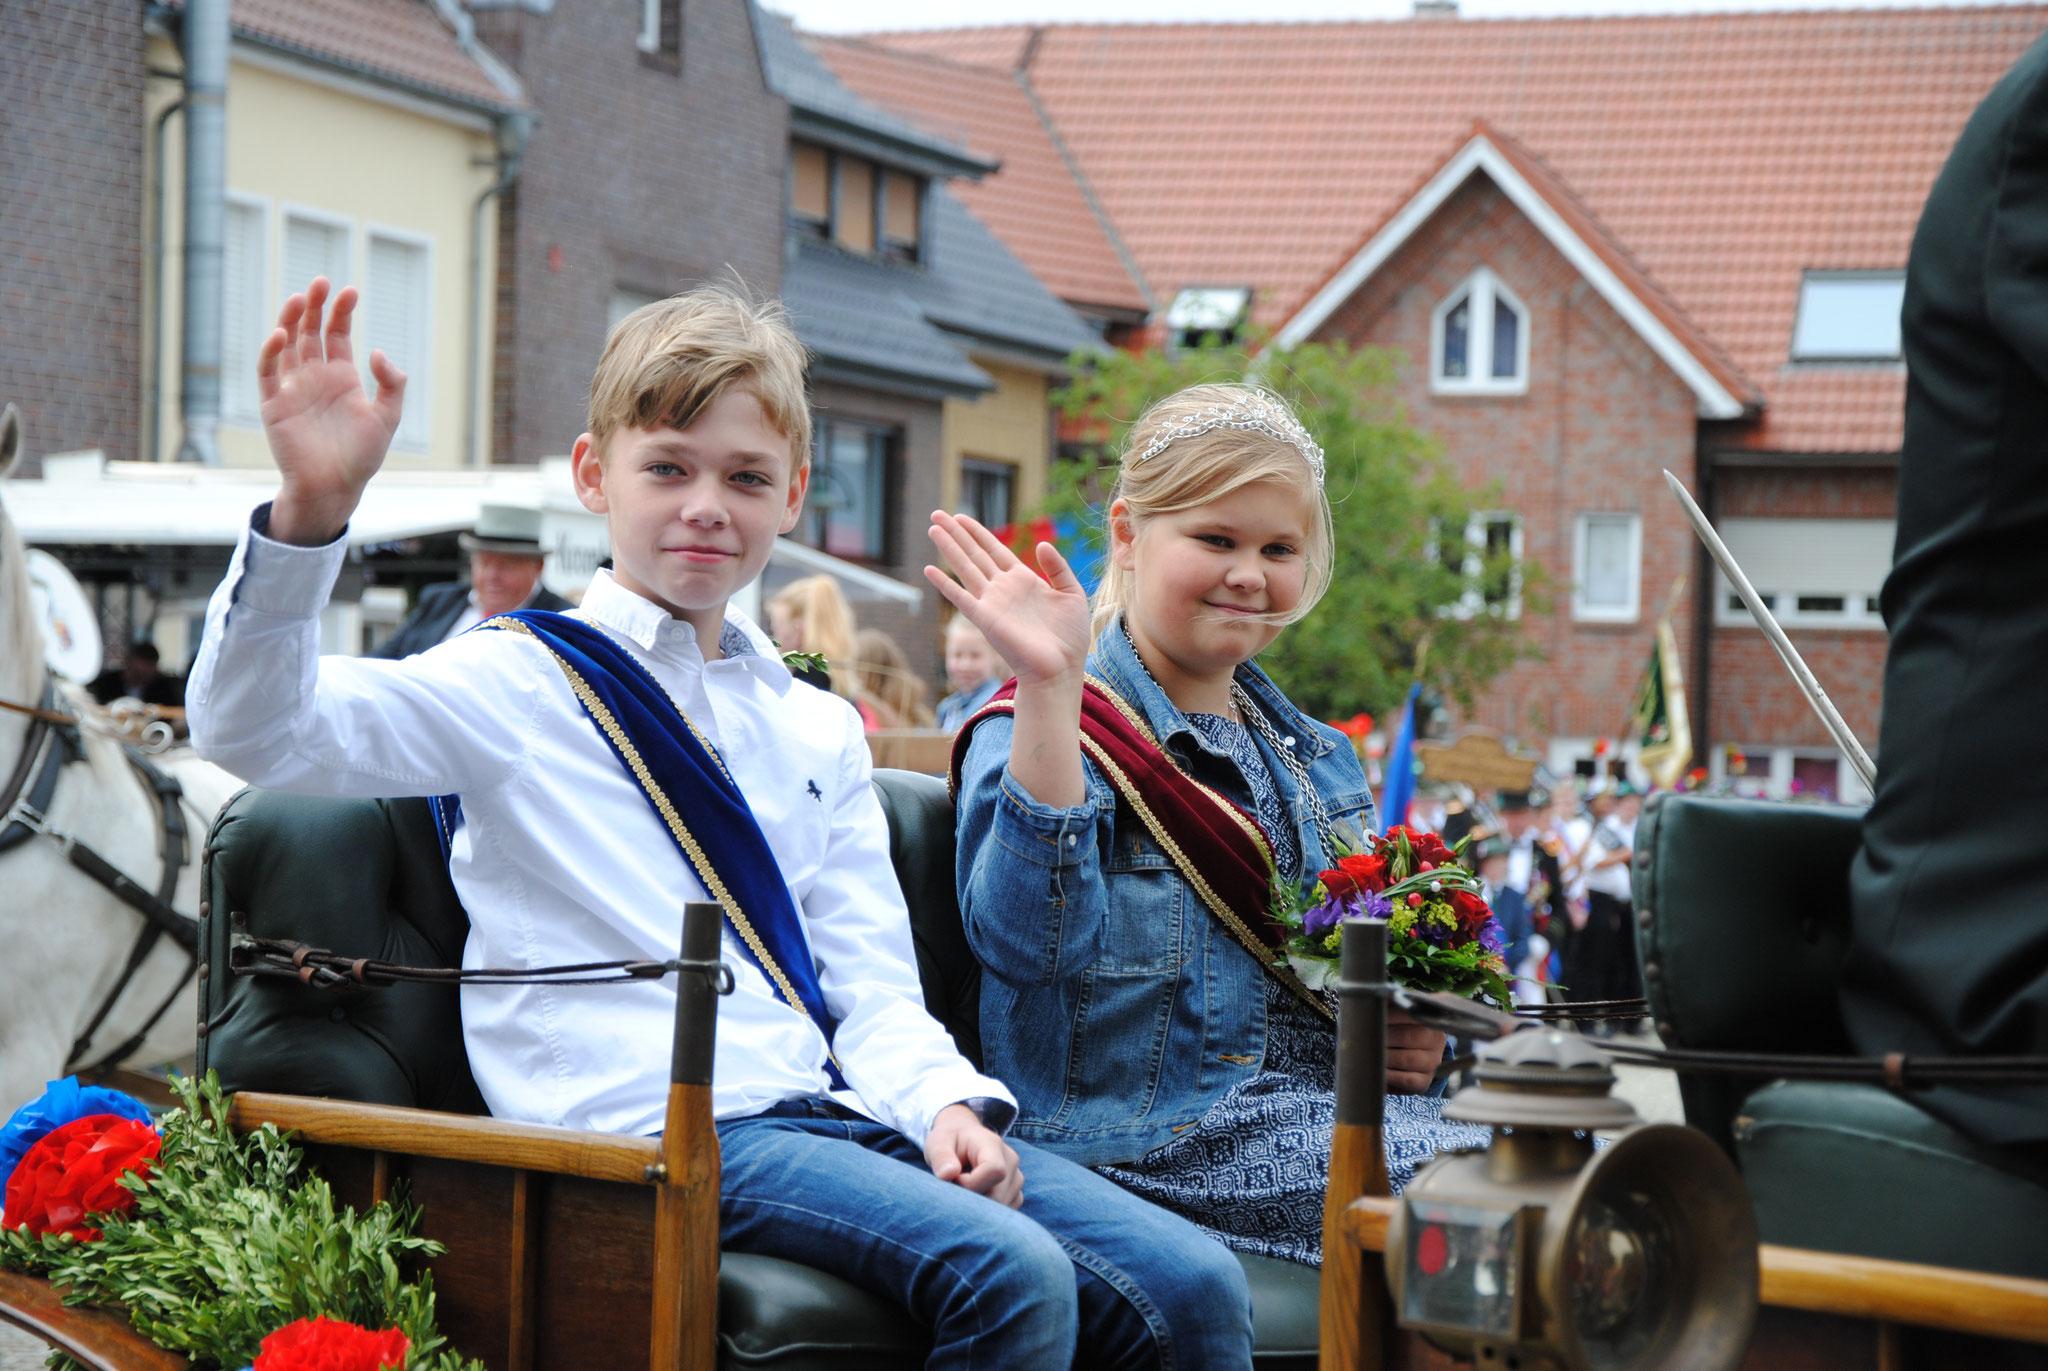 Kinderkönigin Frieda Fröhle und Paul Barlage